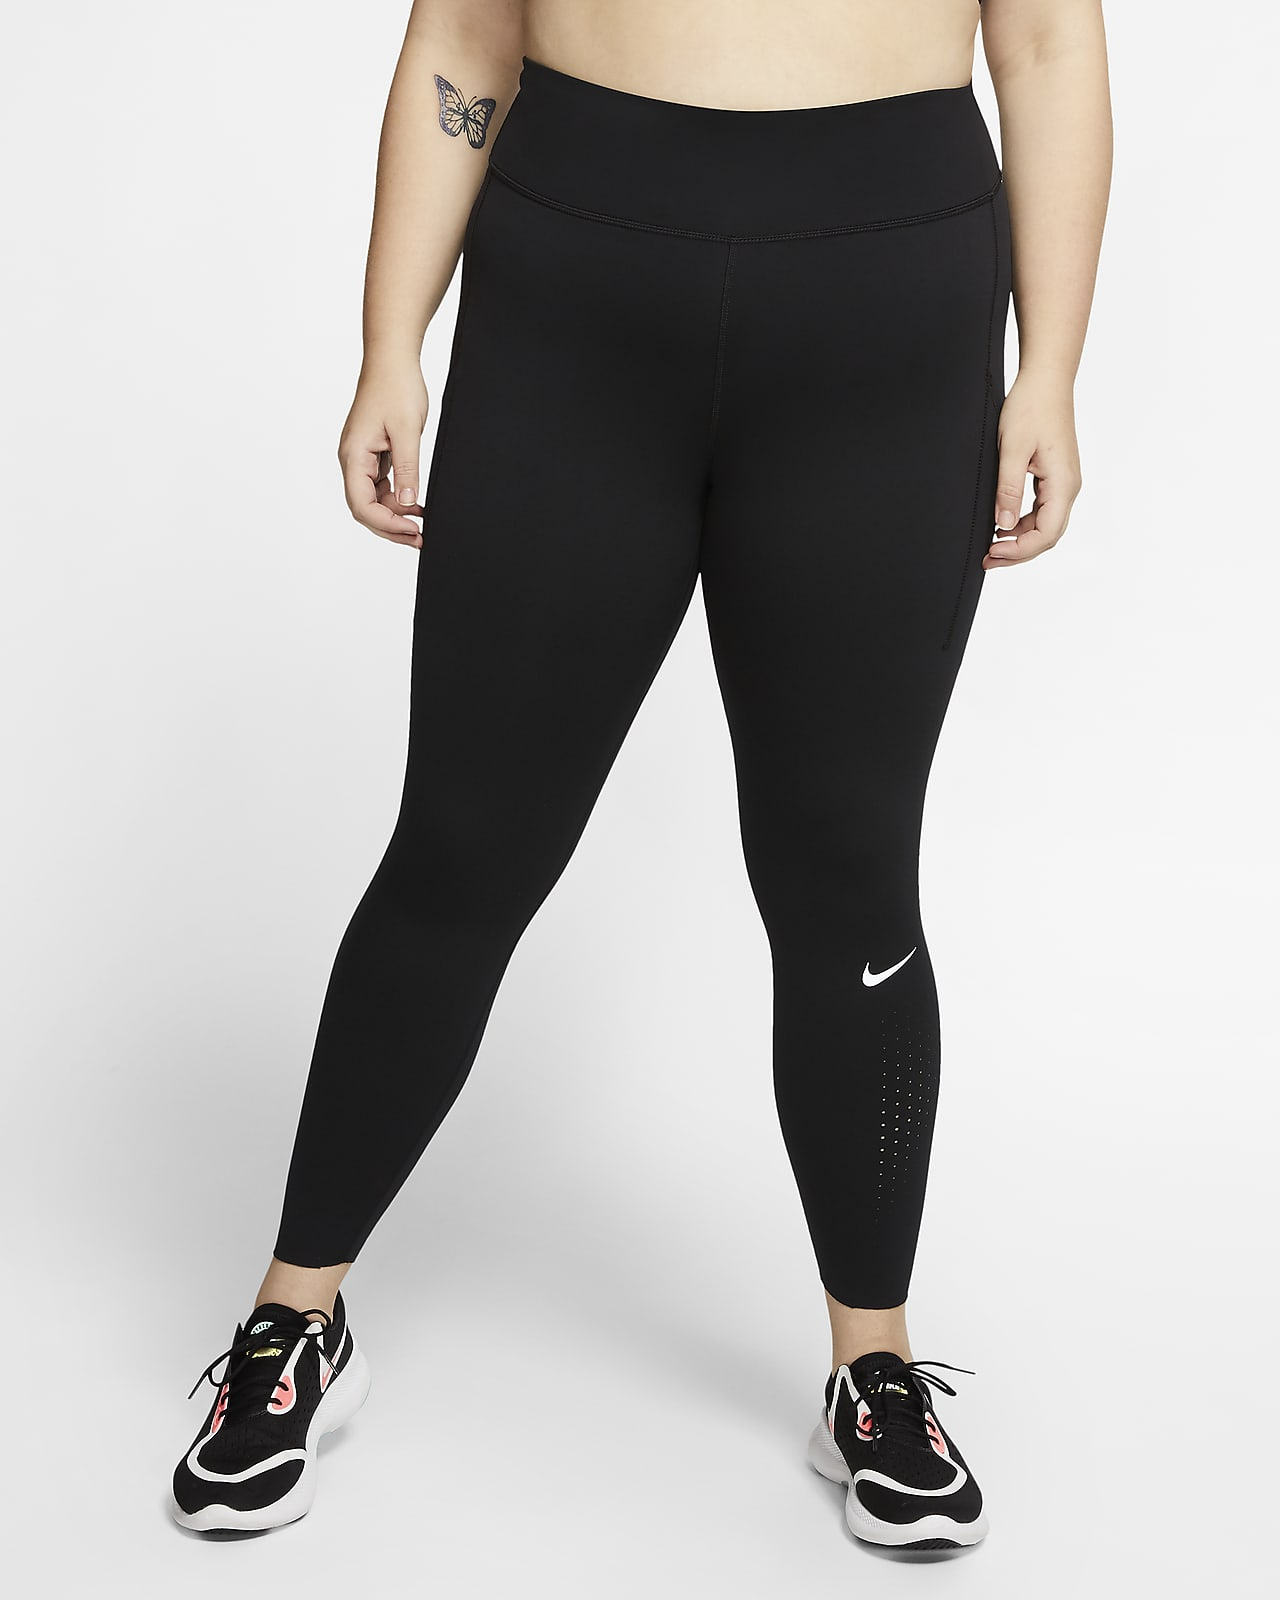 Nike Epic Luxe-løbeleggings til kvinder